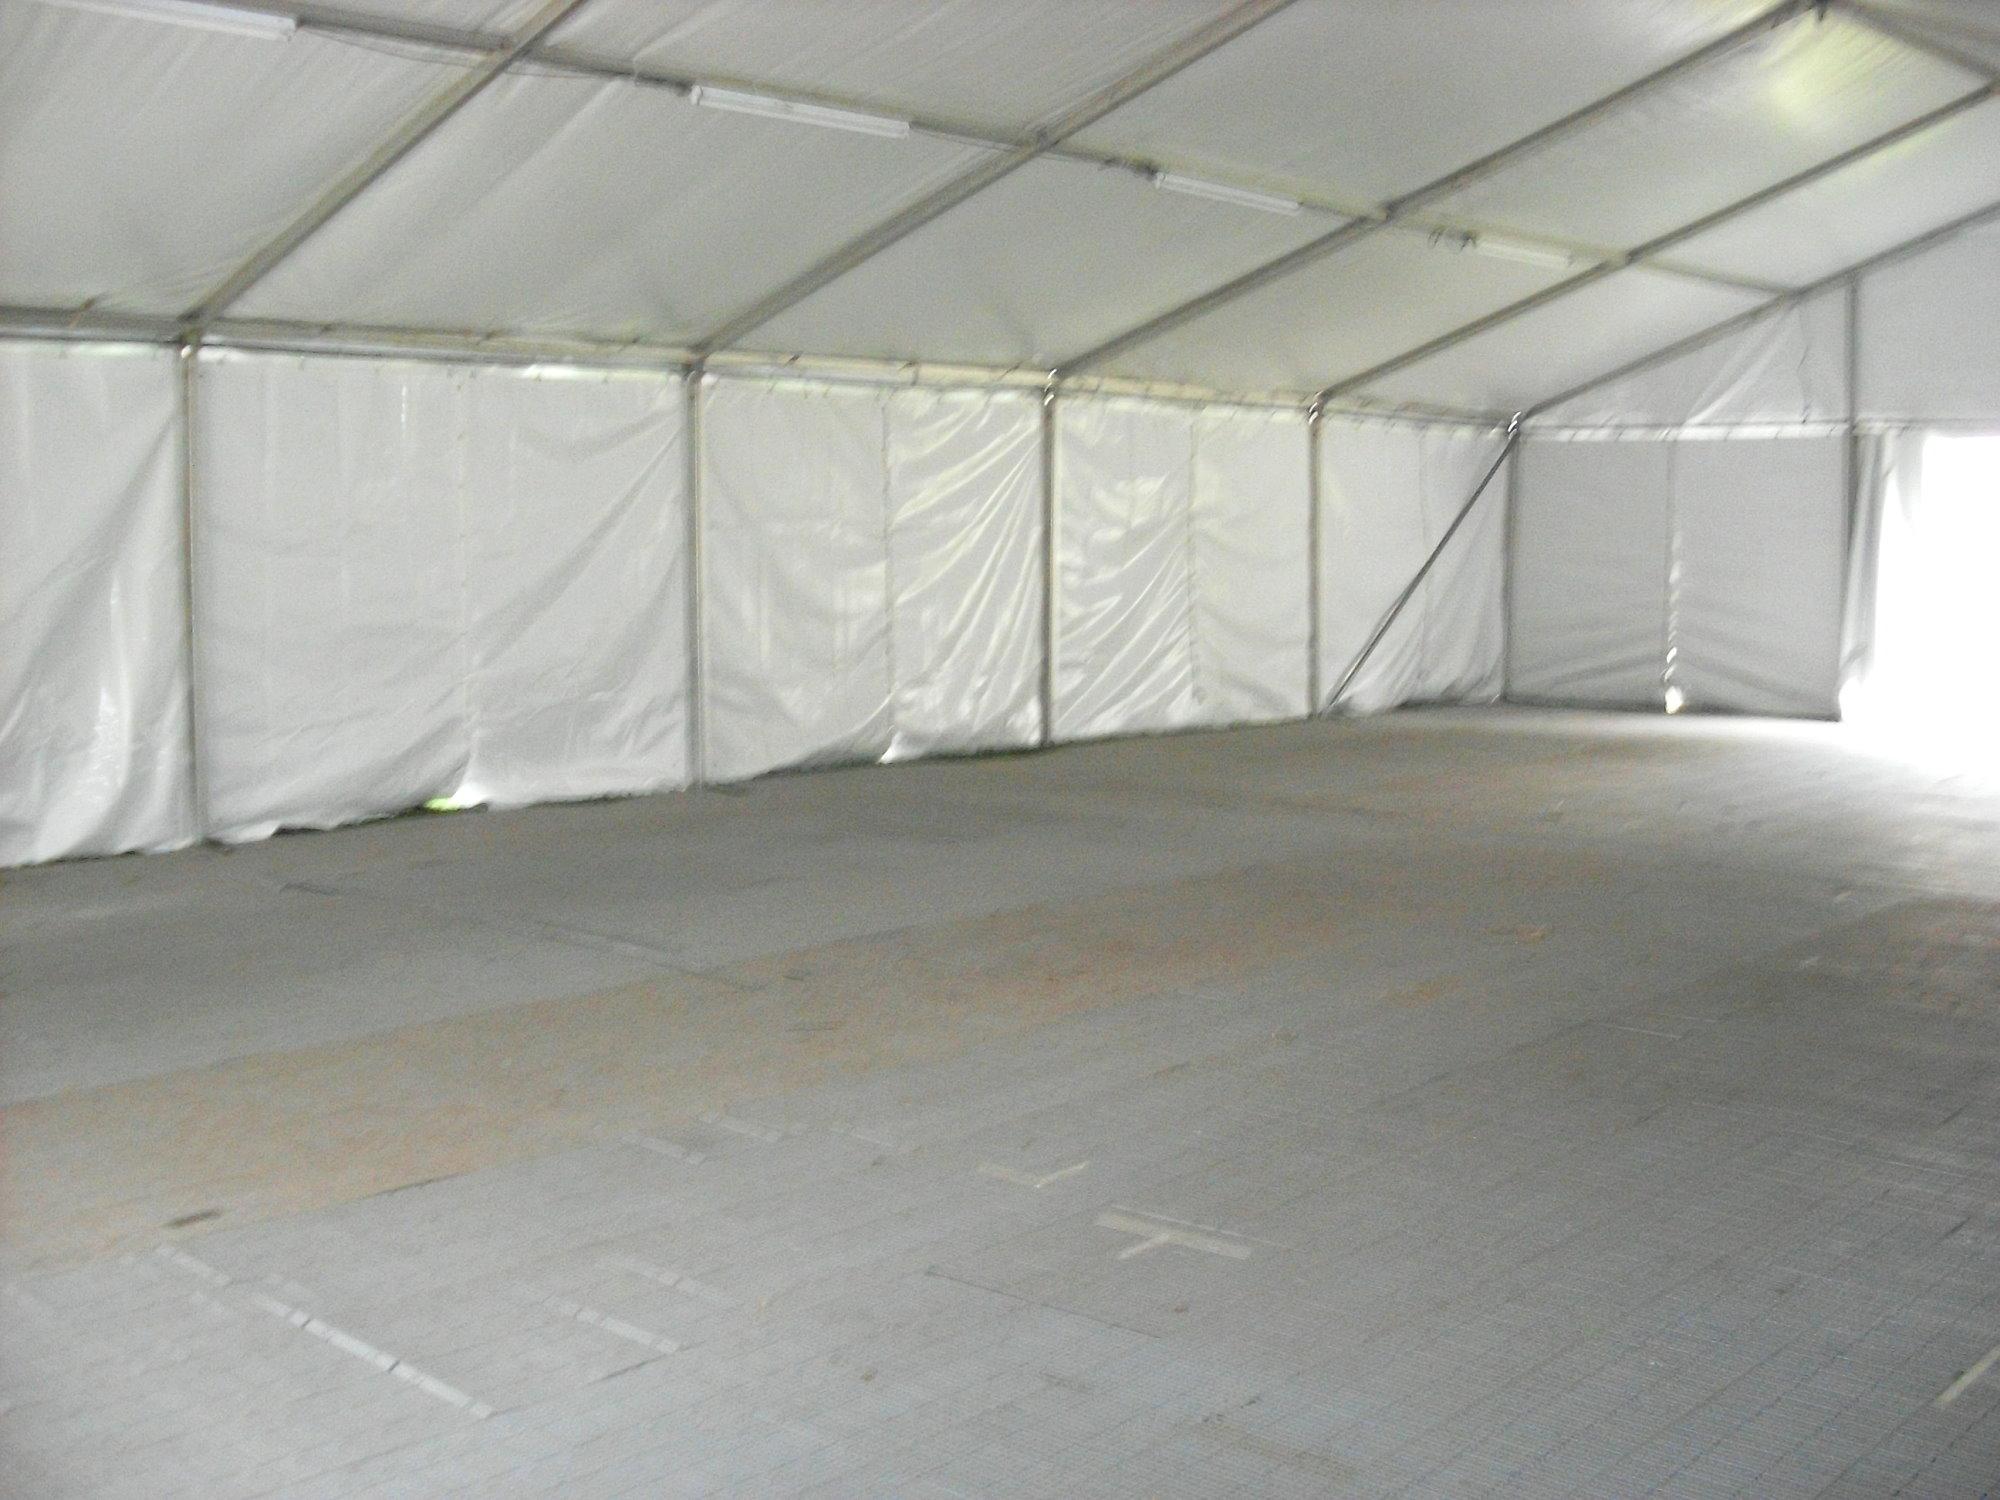 Pavilion Interior with Plastic Profloor